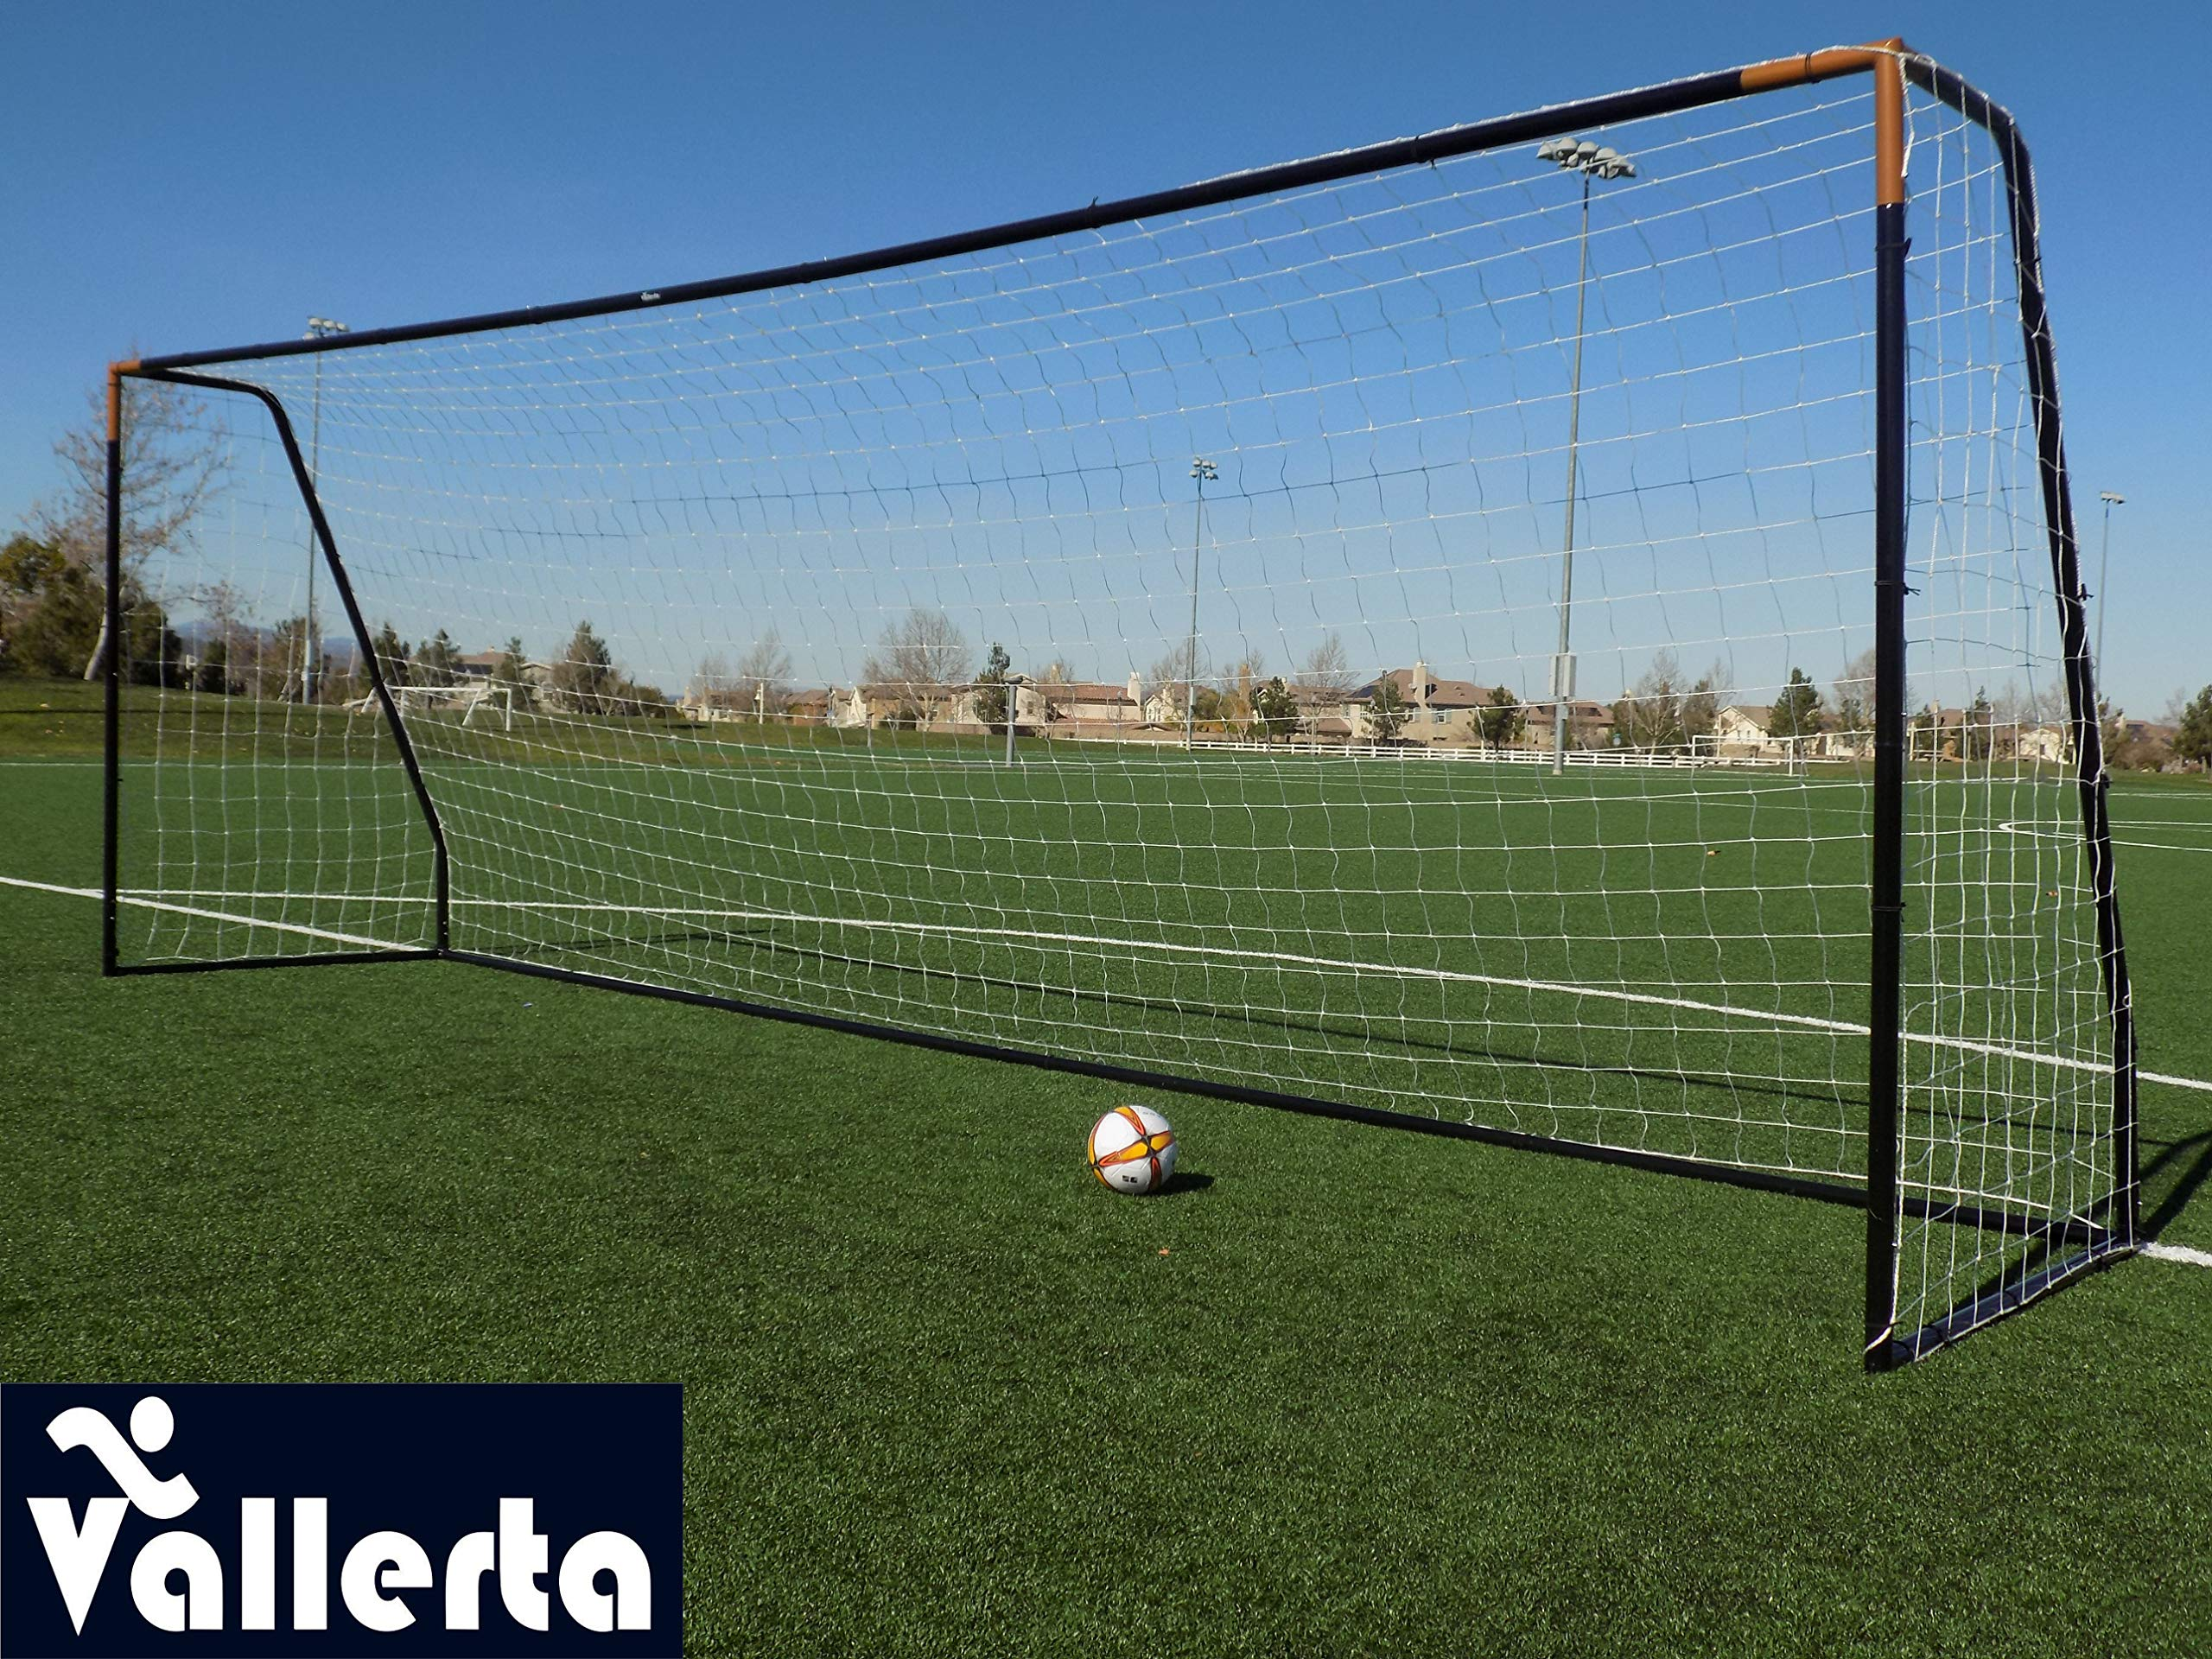 Vallerta Premier 24 X 8 FT. Regulation Size Soccer Goal w/Premium Weatherproof 4MM Net. Strongest 50MM Diameter Steel Frame w/Black/Gold Corrosion Resistant Coating. Newest 8x24 Foot Design(1Net)